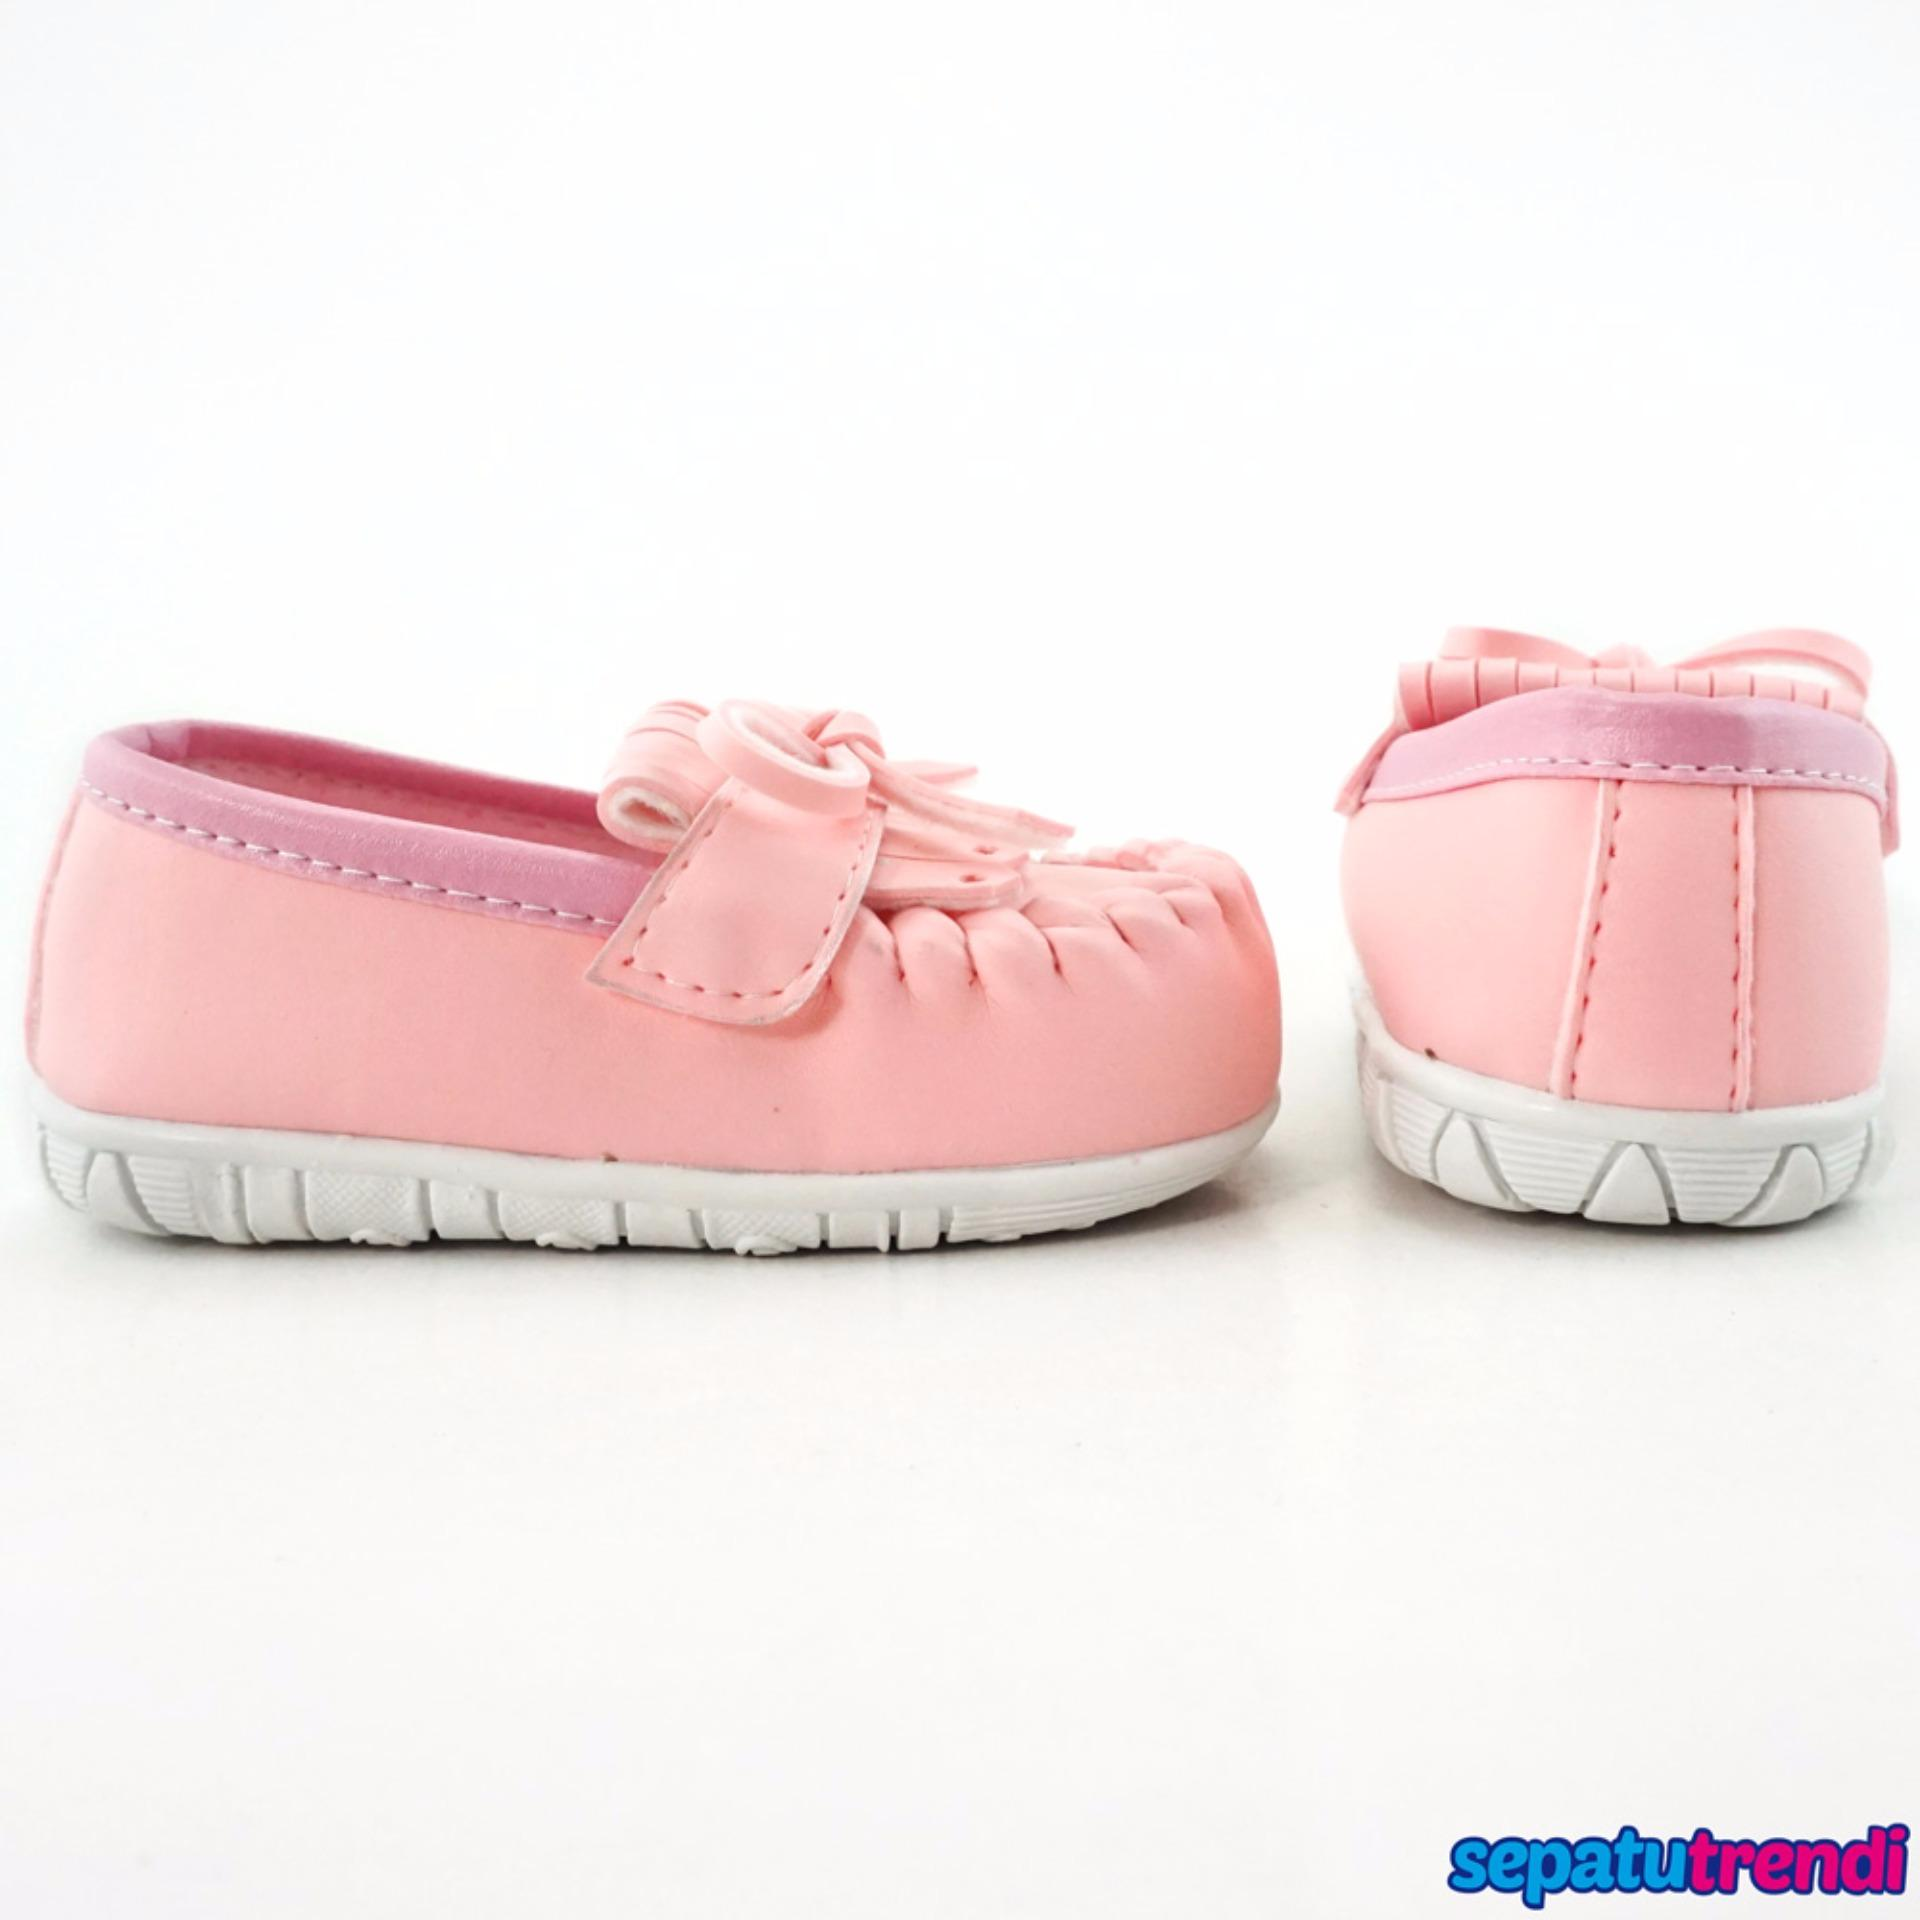 TrendiShoes Sepatu Anak Bayi Perempuan Pita Elegan JVNRJT - Pink .